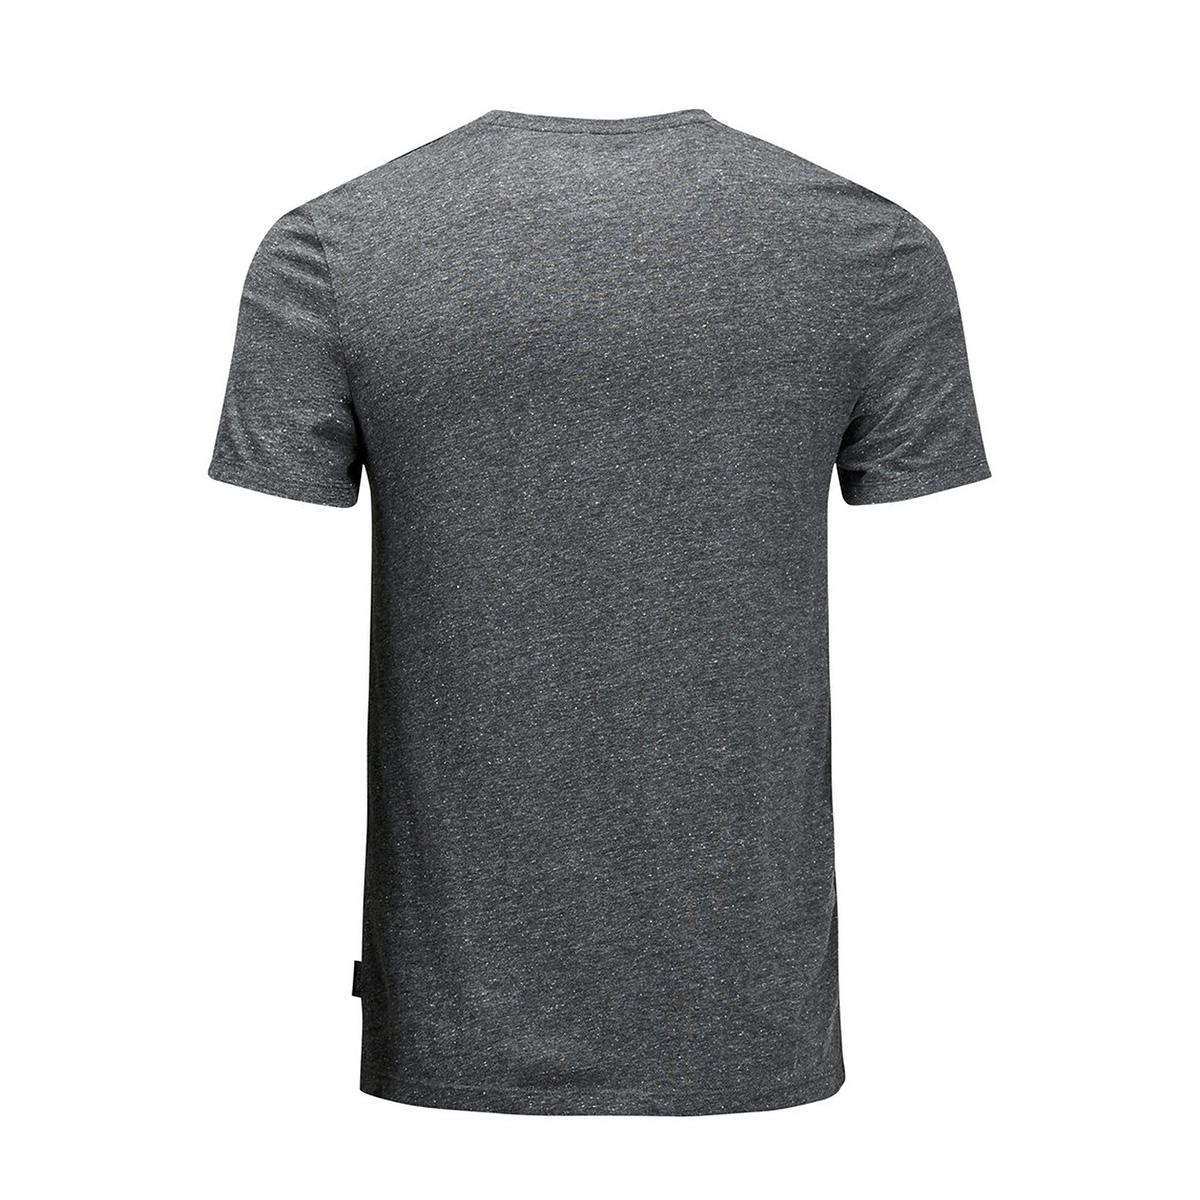 jortort tee melange pack 12125157 jack & jones t-shirt asphalt